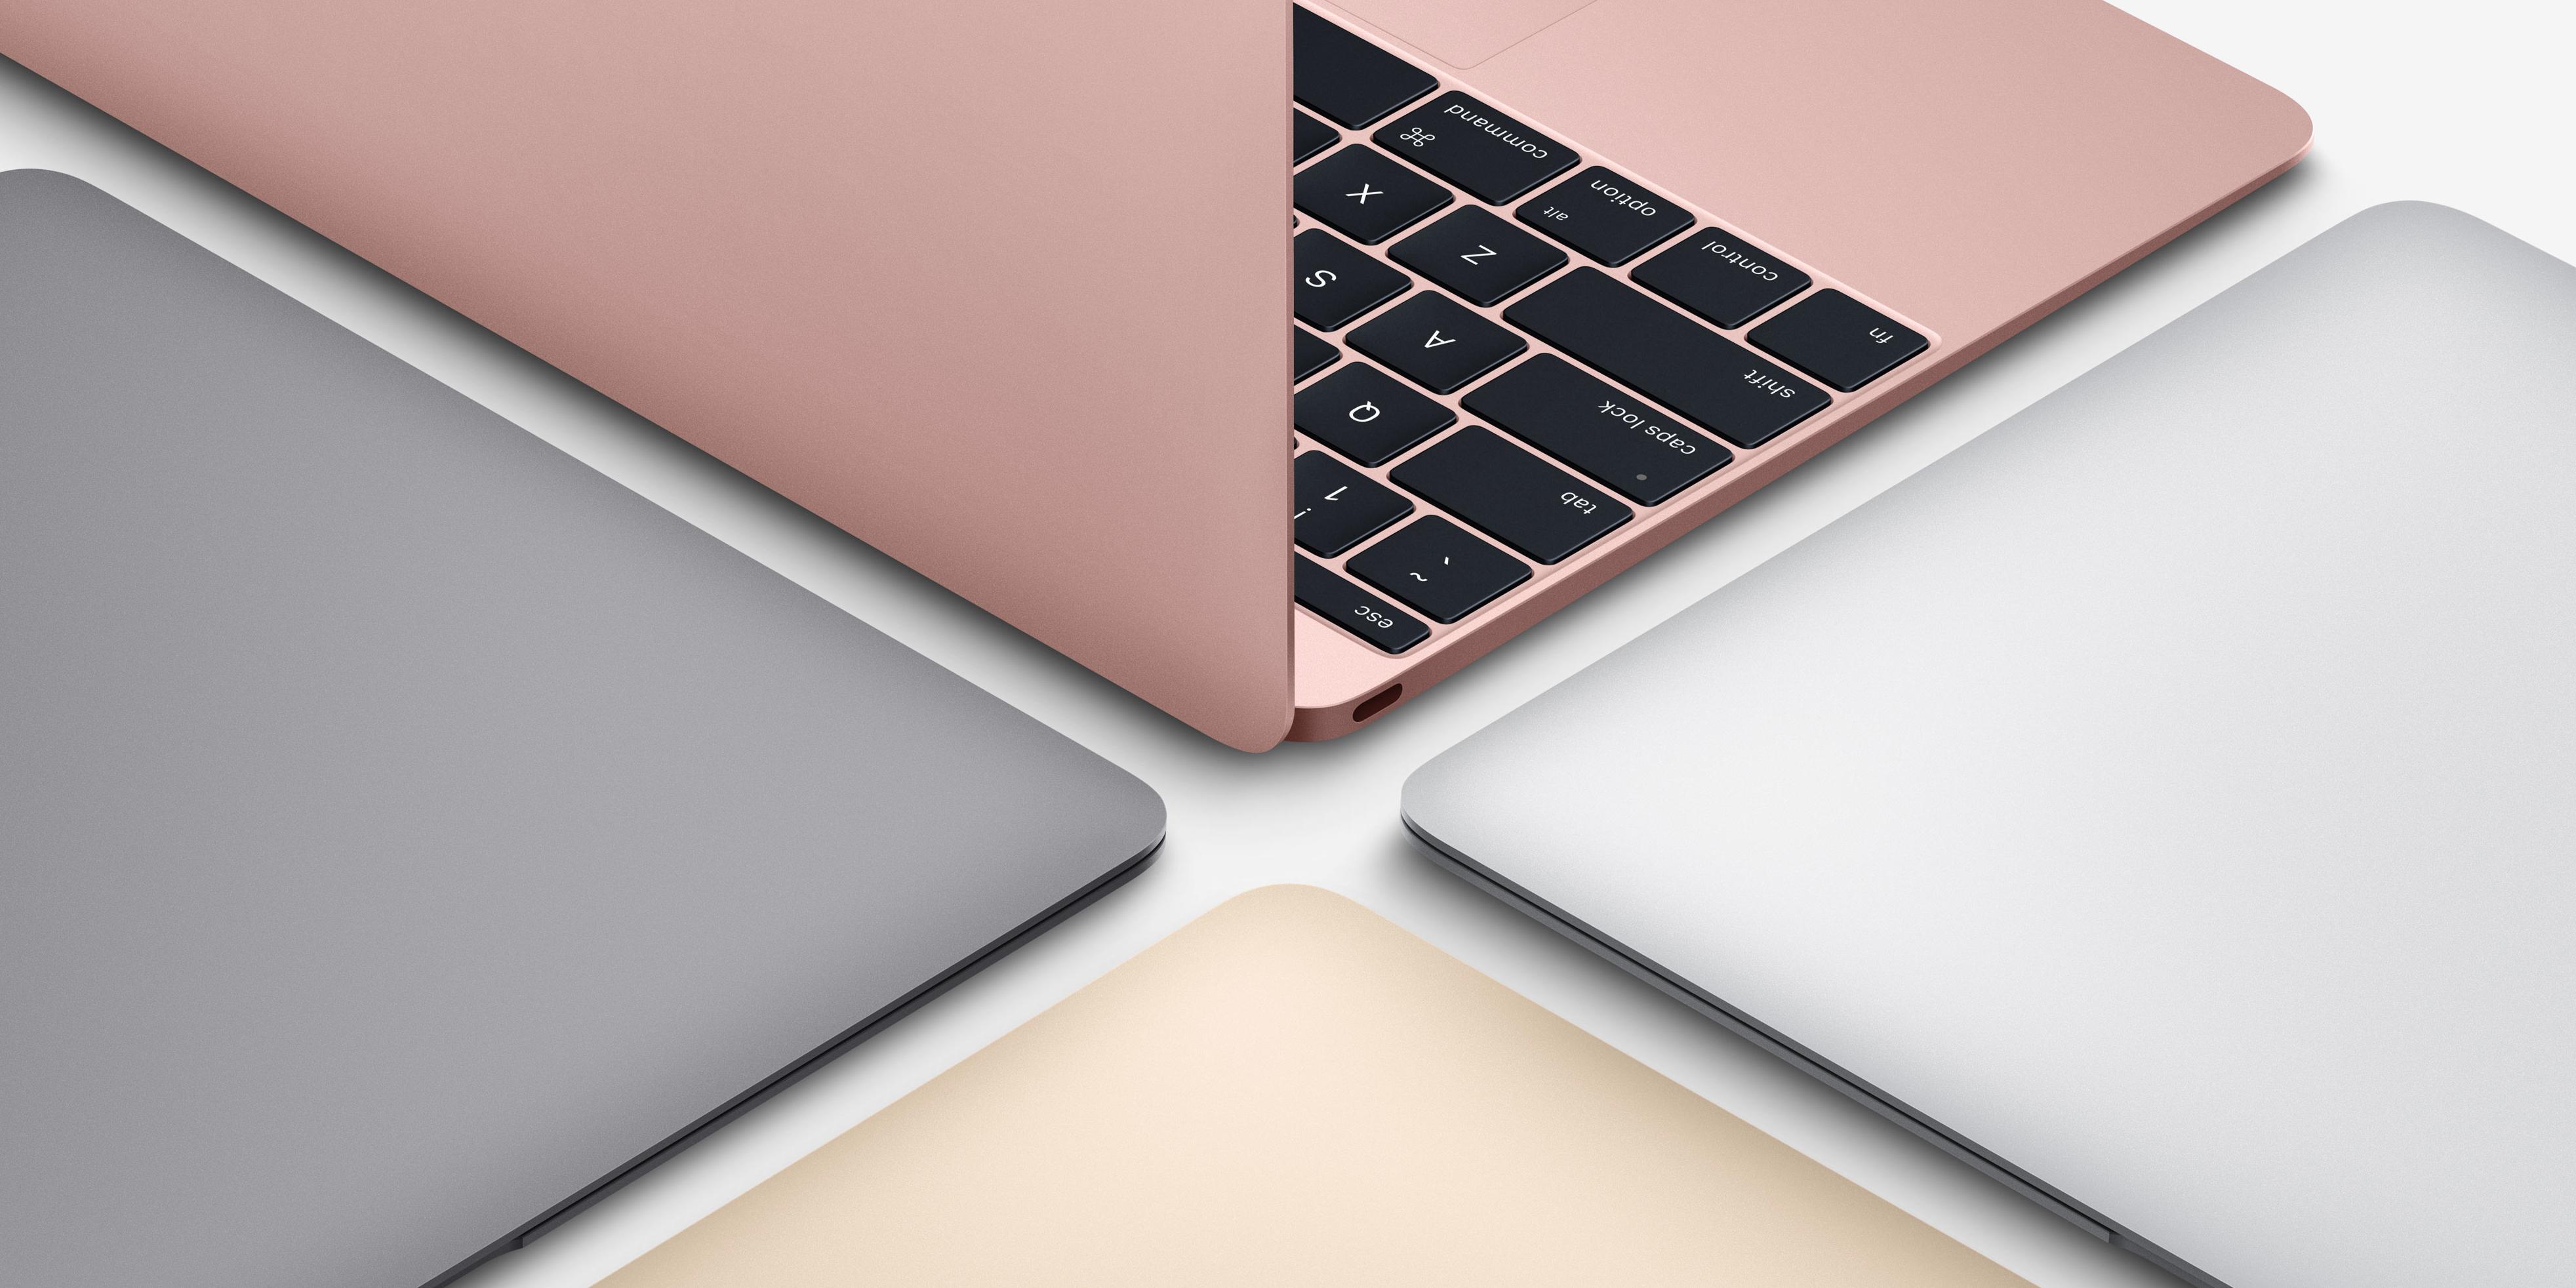 Apple 12-inch MacBook + iPad Pro see big 1-day price drops